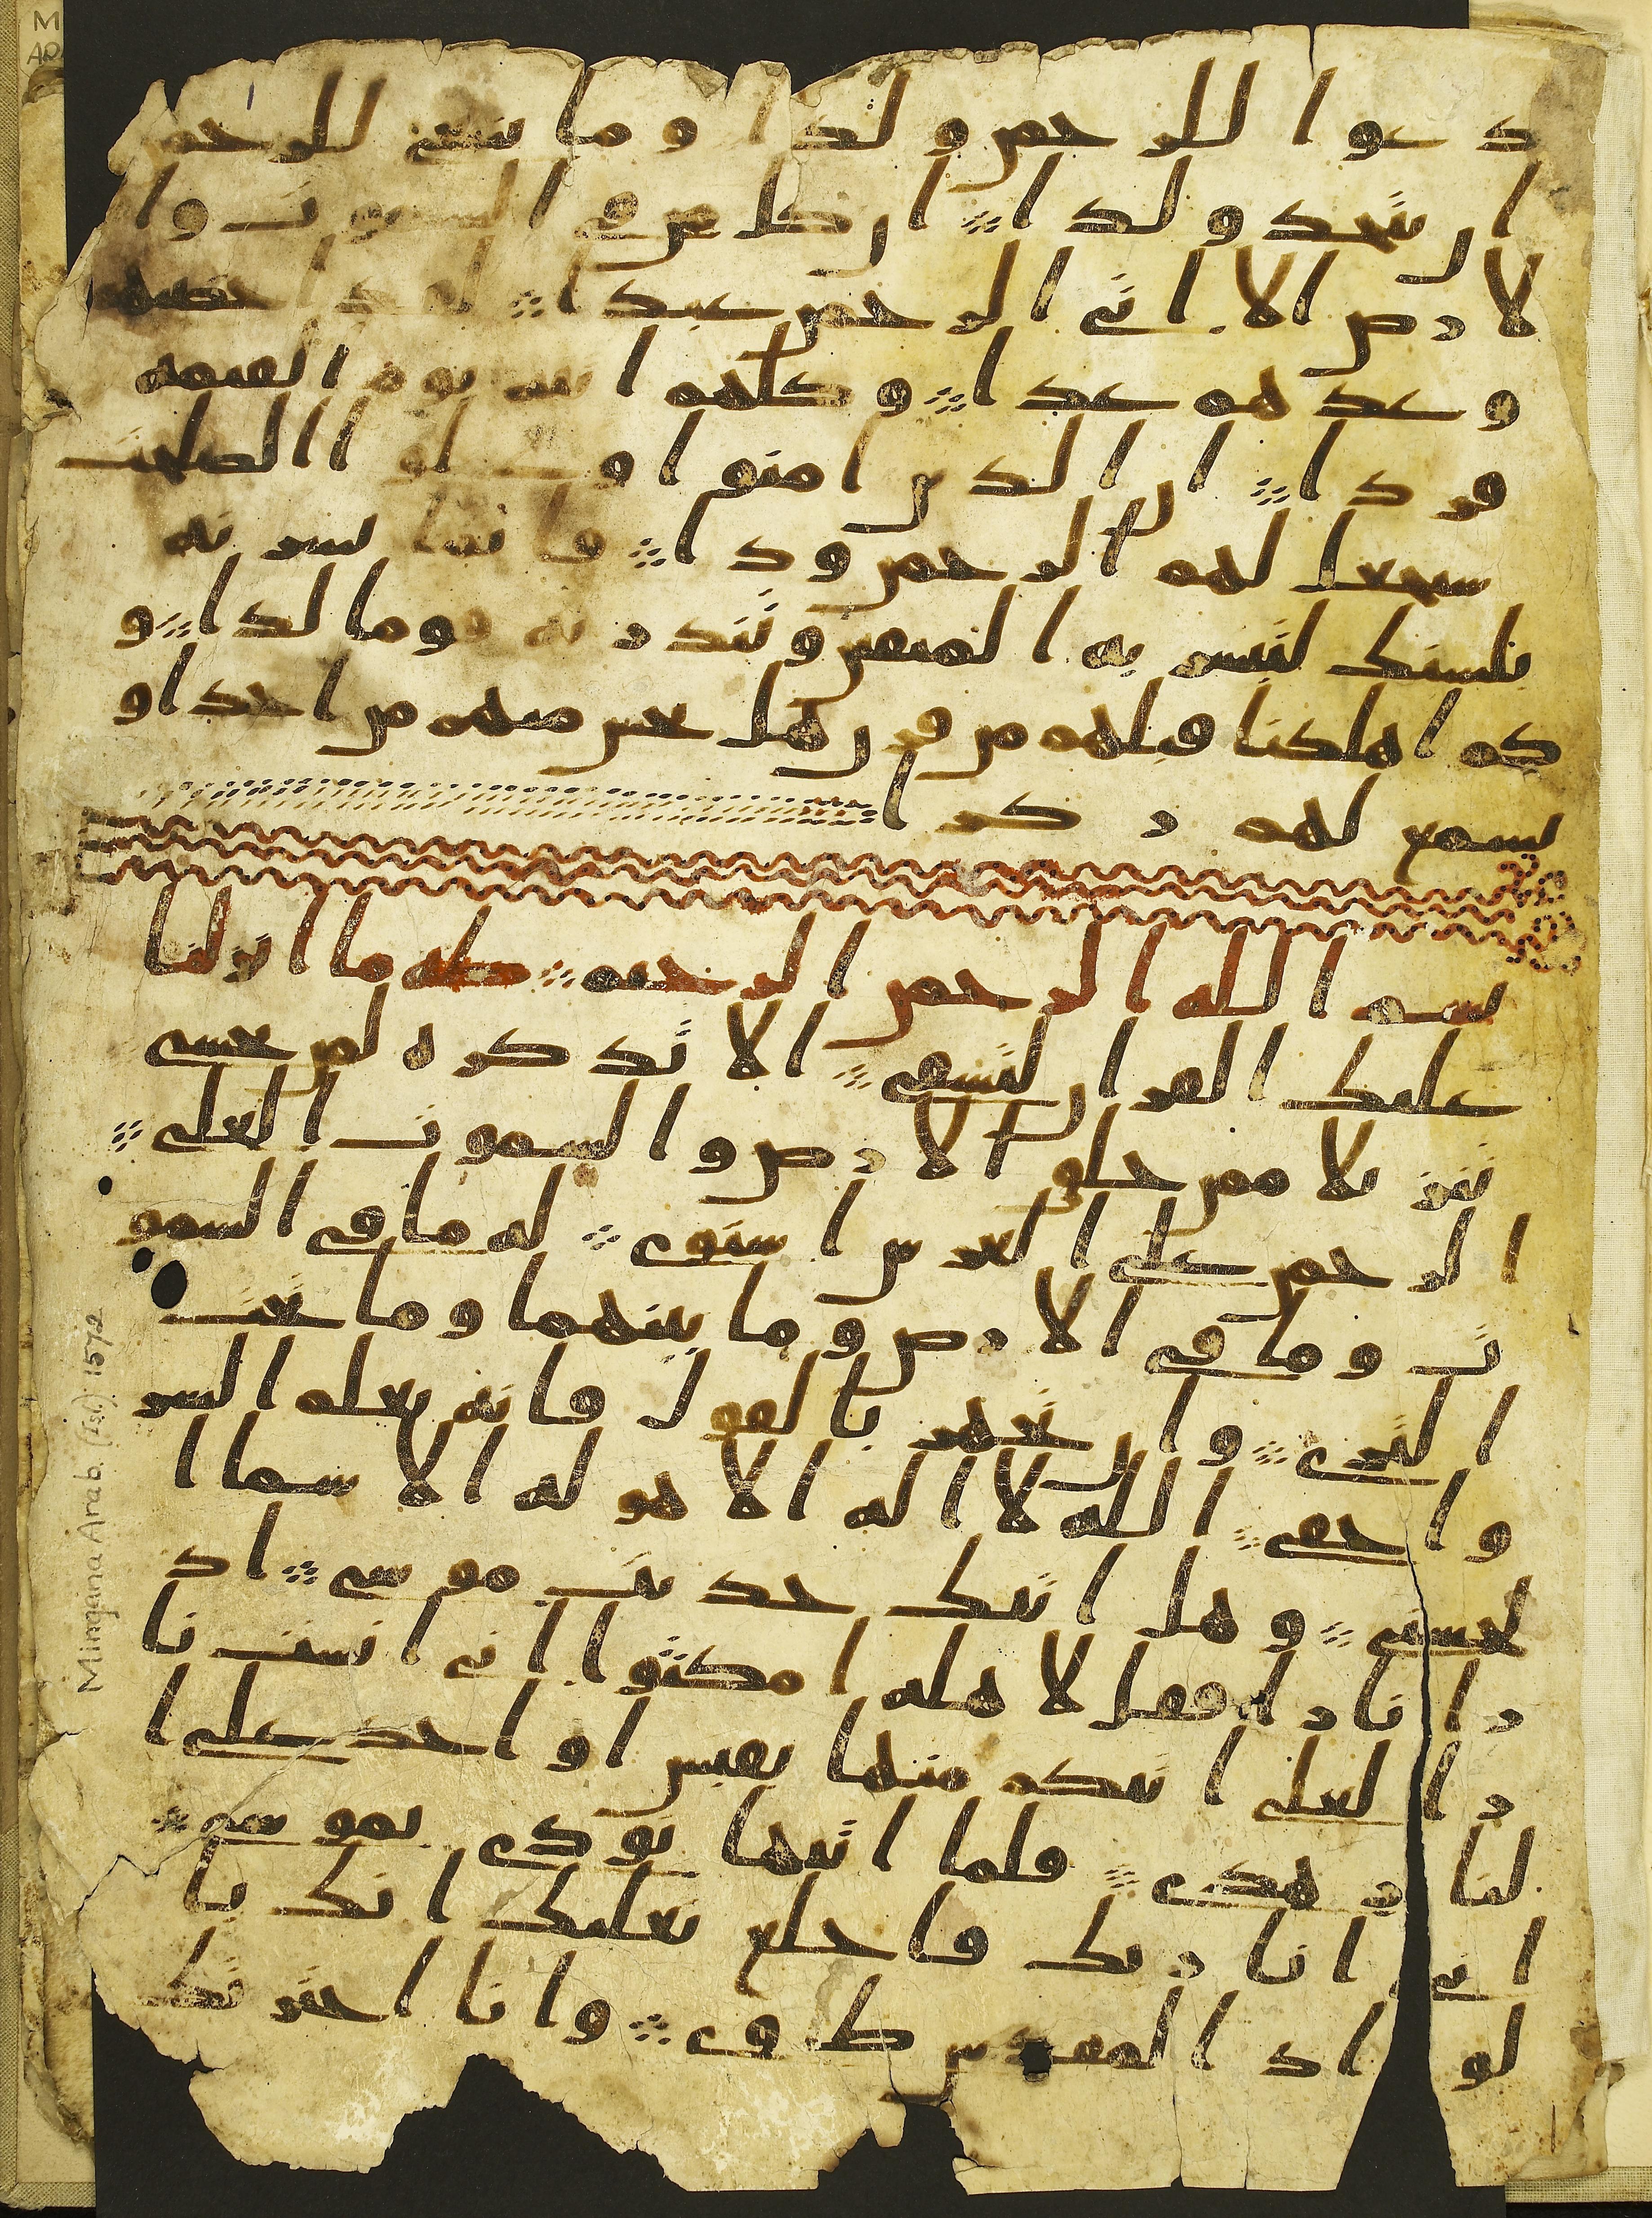 Verses 91-98 of Surat Maryam, followed by the first 12 verses of Surat Taha